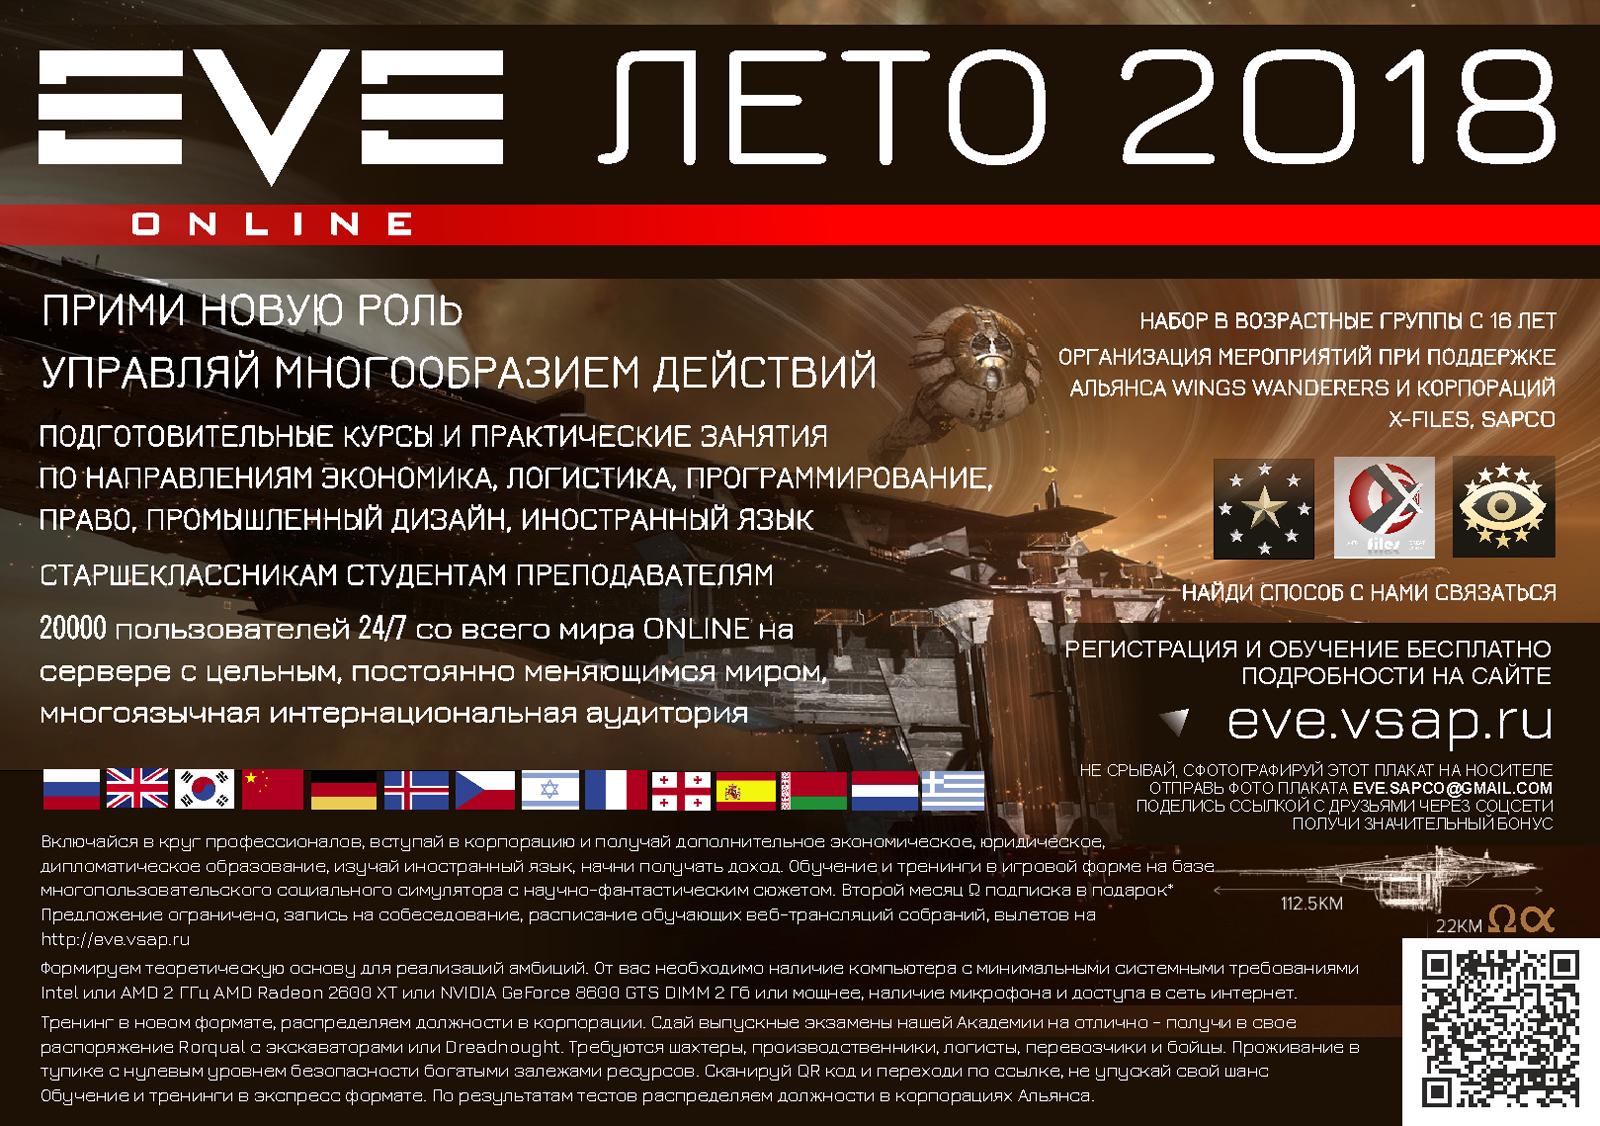 SAPCO рекрутер Альянса | EVE online